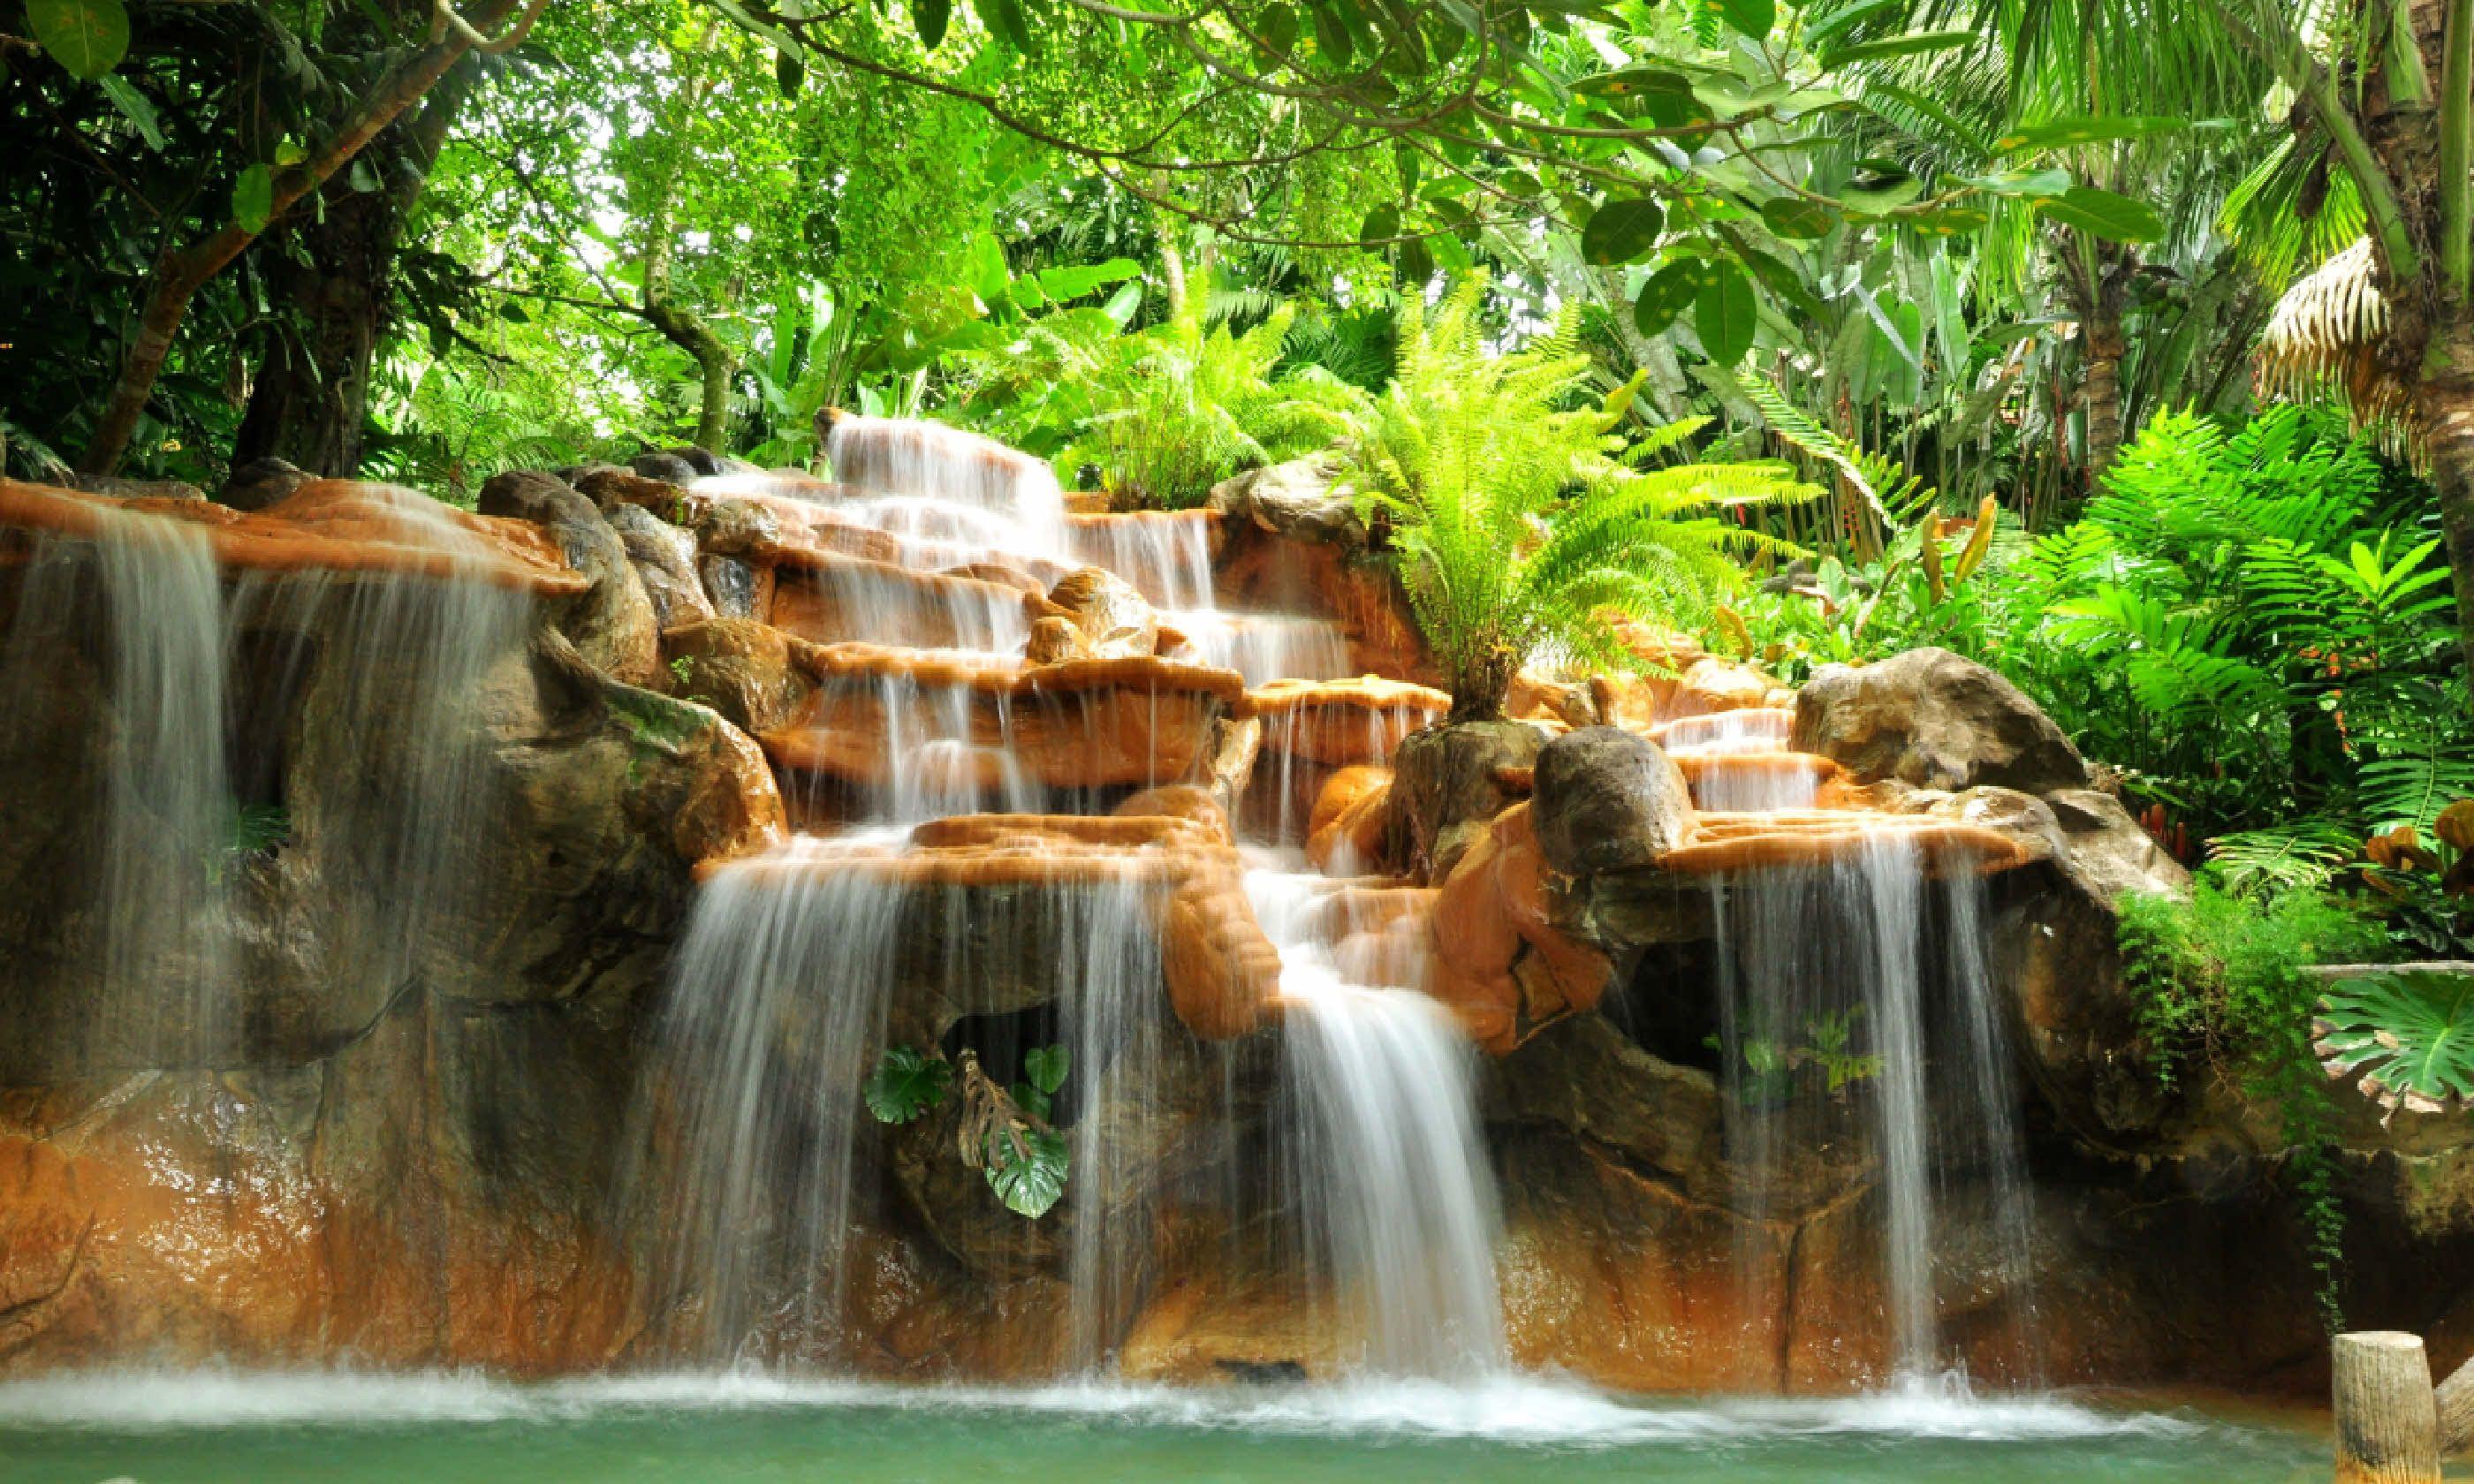 Hot springs in Costa Rica (Shutterstock)